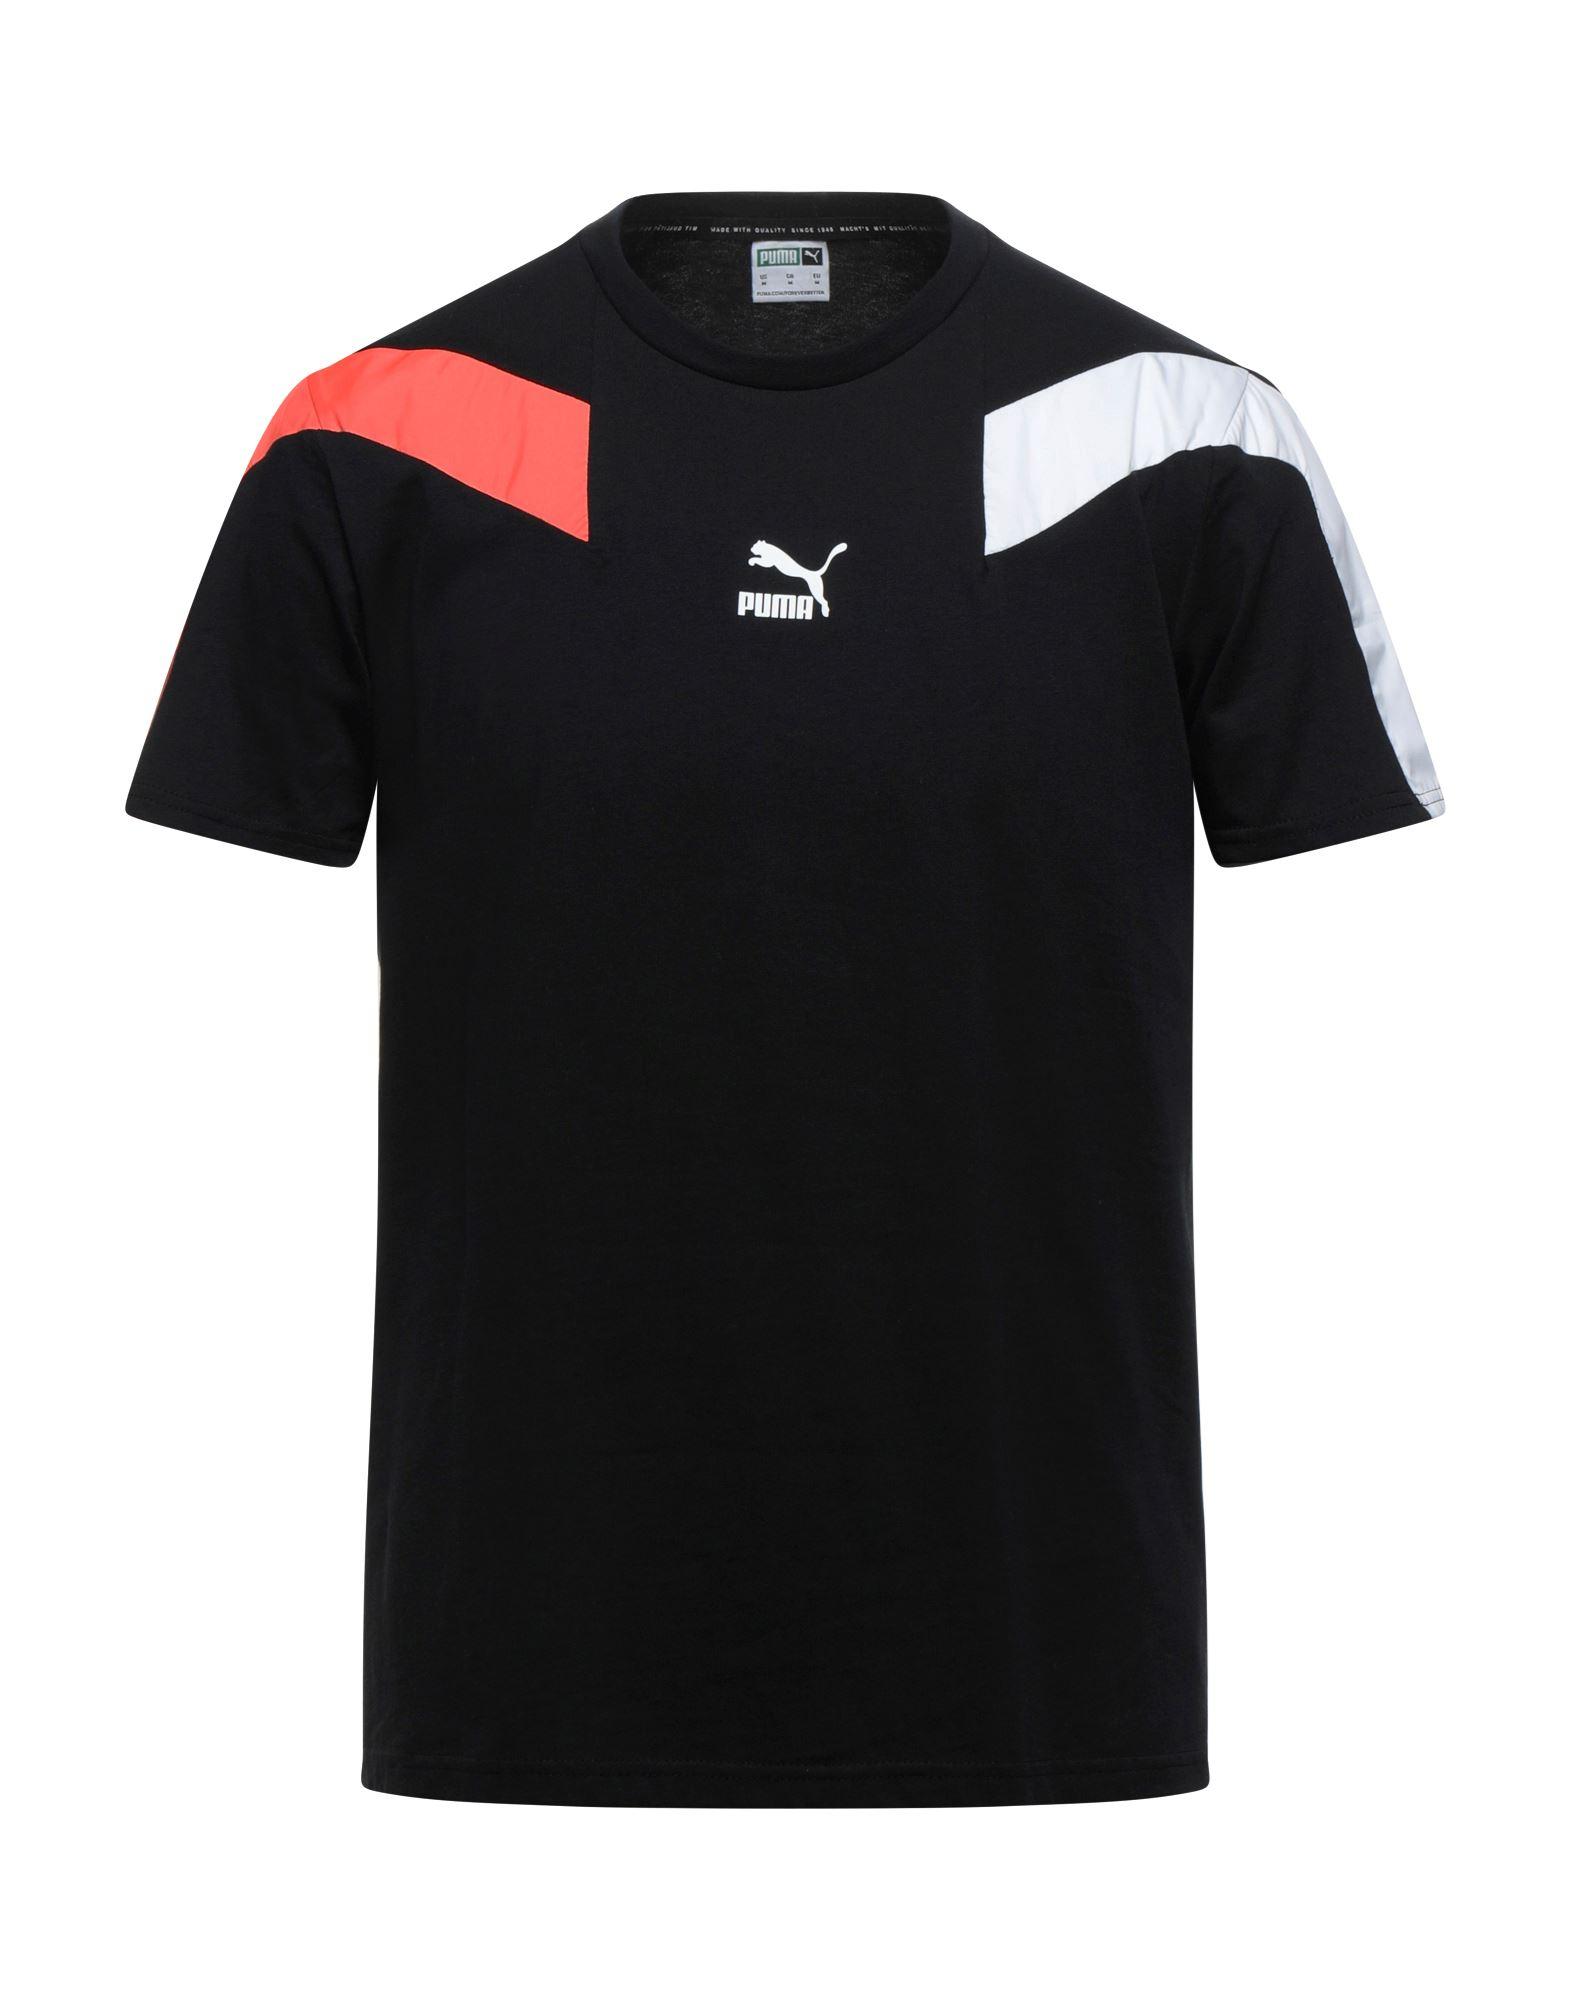 PUMA Футболка puma футболка женская puma active logo heather размер 44 46